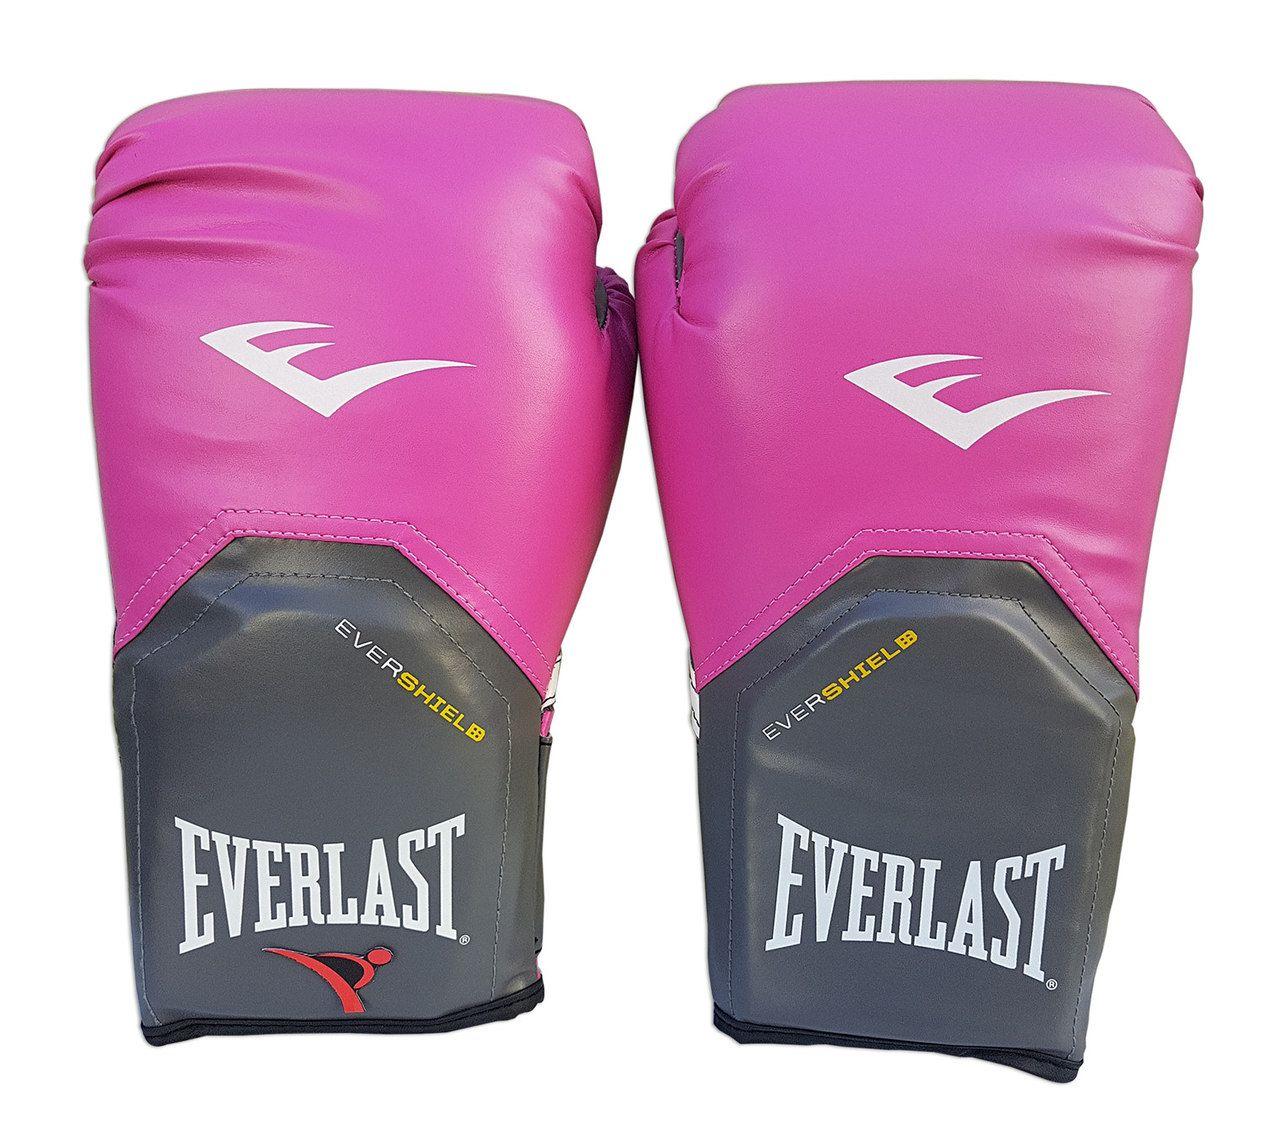 Luva de Boxe / Muay Thai Feminina 14oz - Rosa - Pro Style - Everlast  - PRALUTA SHOP